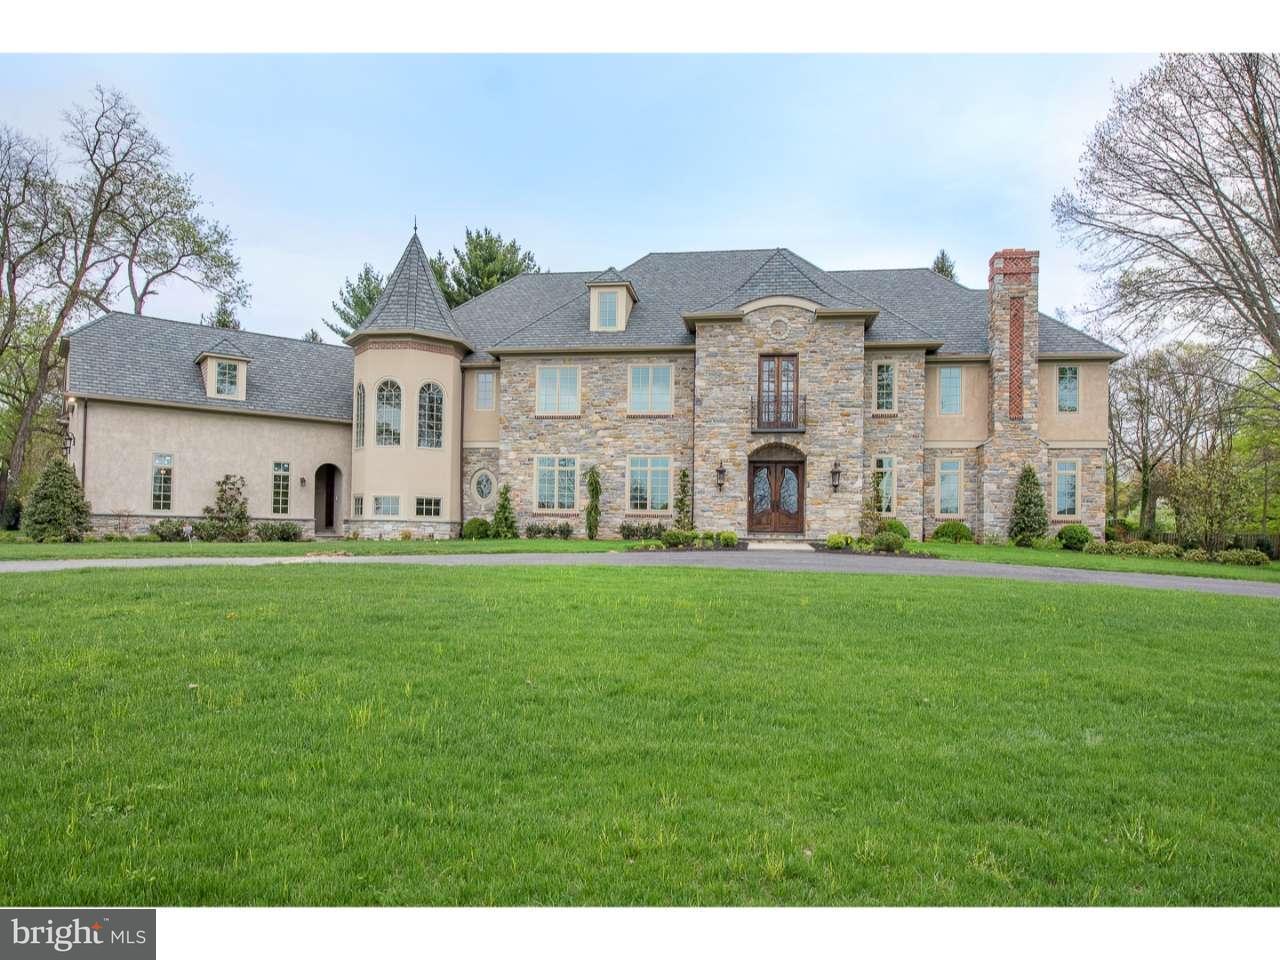 Single Family Home for Sale at 264 ABRAHAMS Lane Villanova, Pennsylvania 19085 United States